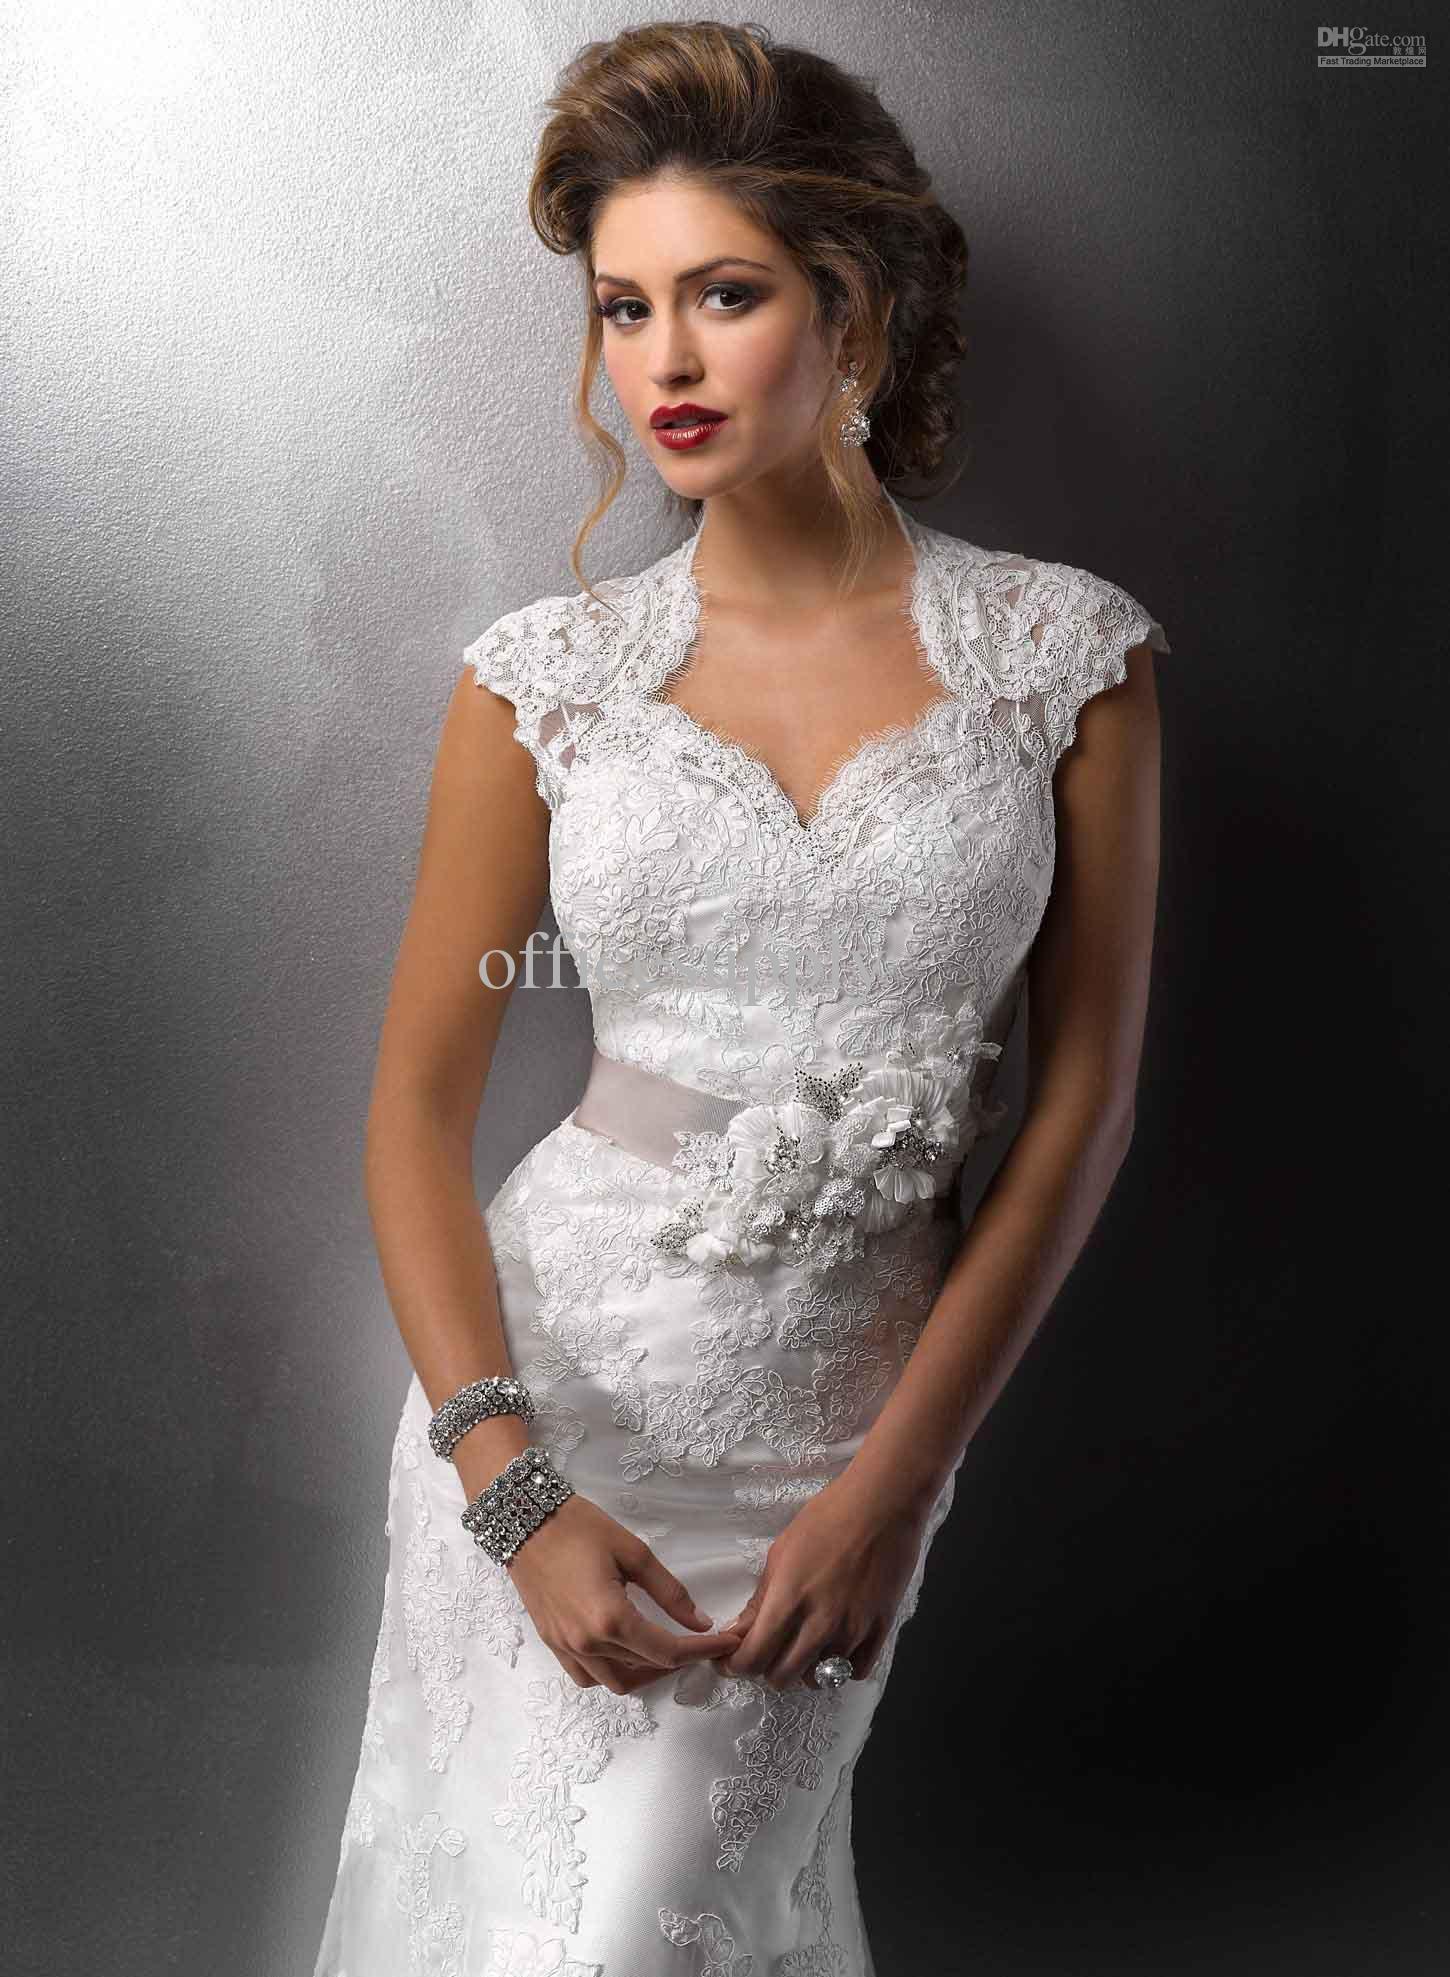 Short Wedding Dress with Leggings